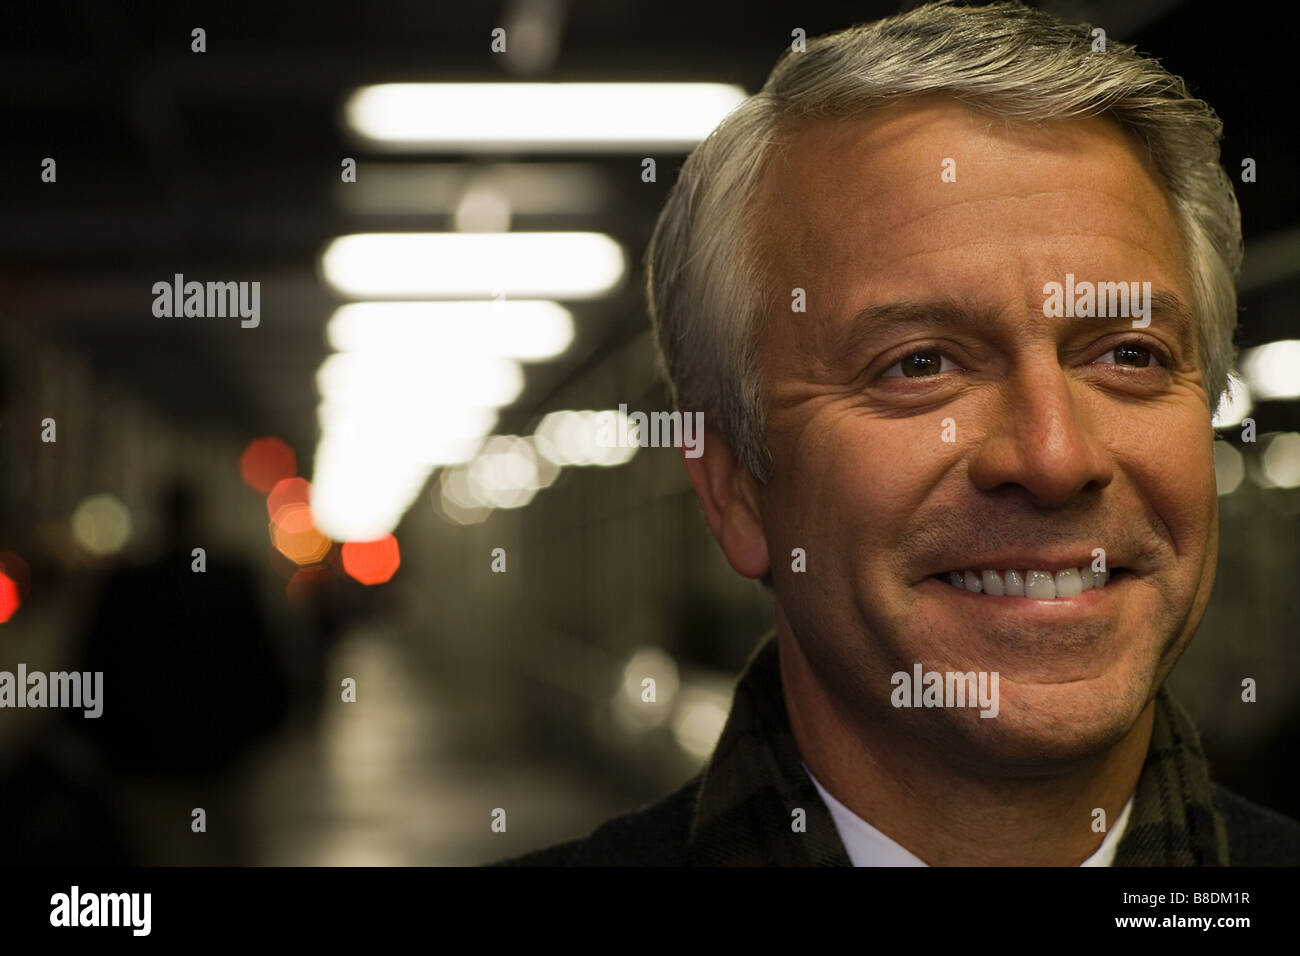 Headshot ein lächelndes reifer Mann Stockbild